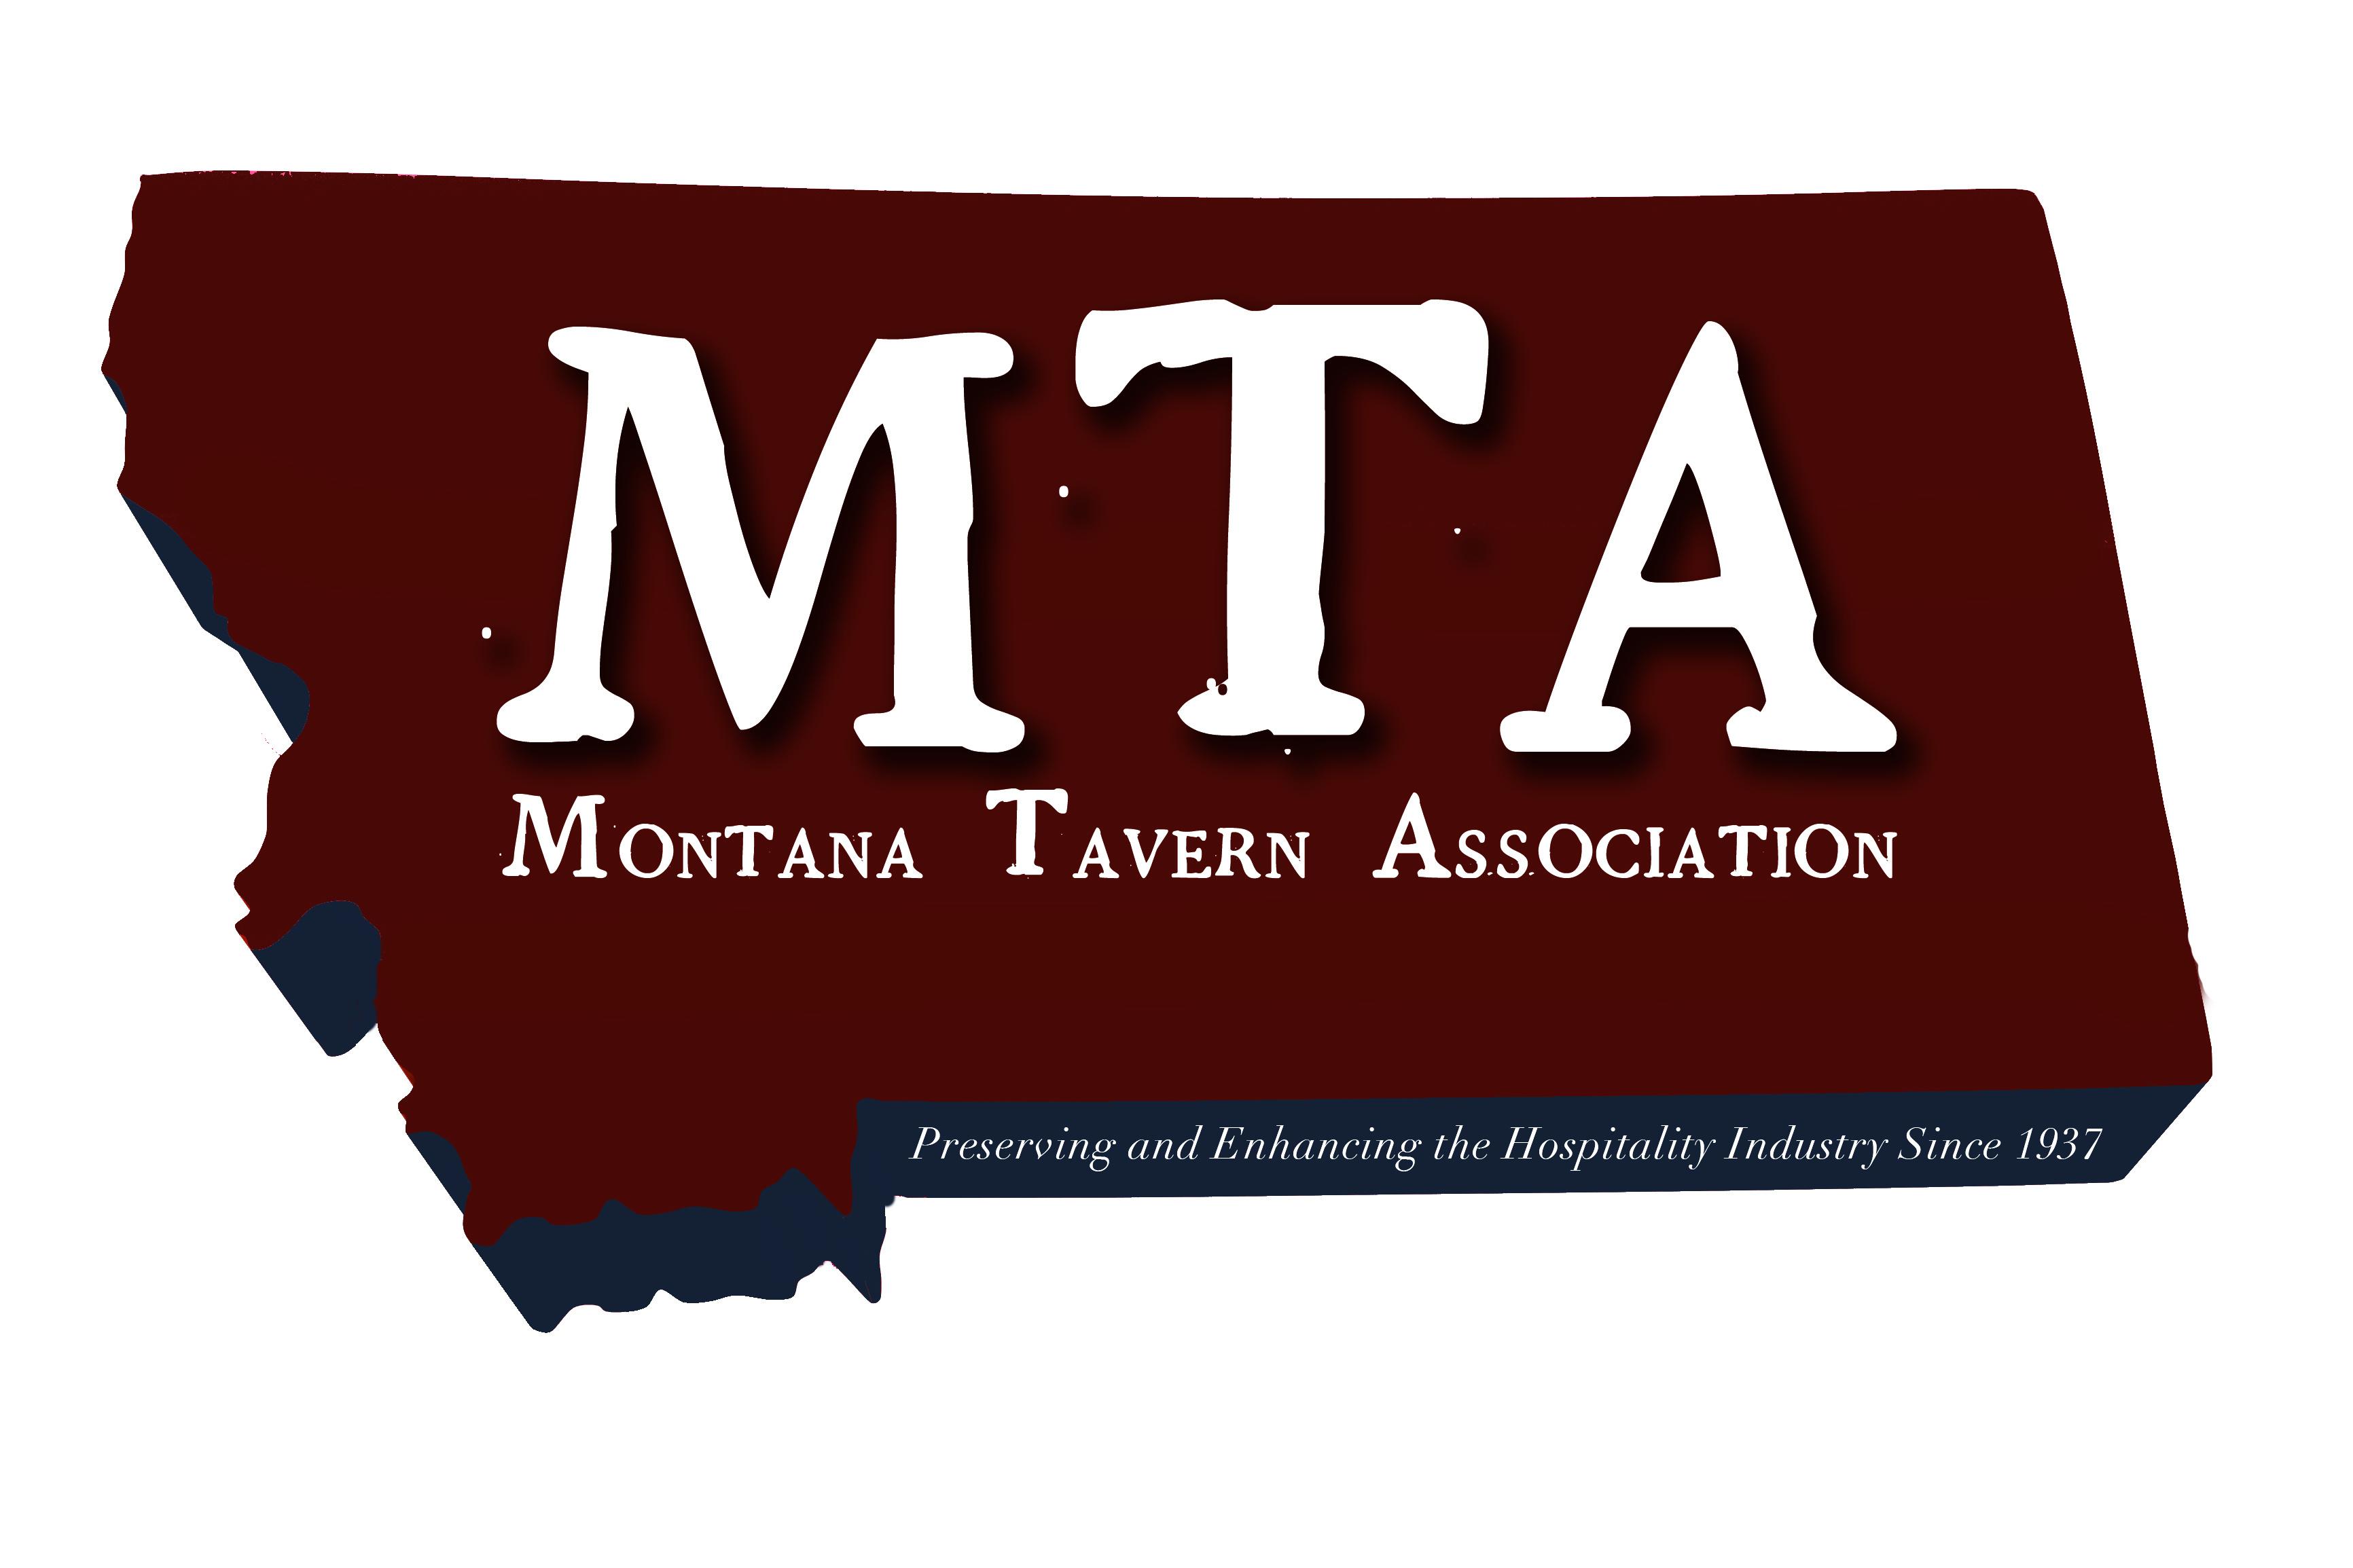 Montana Tavern Association